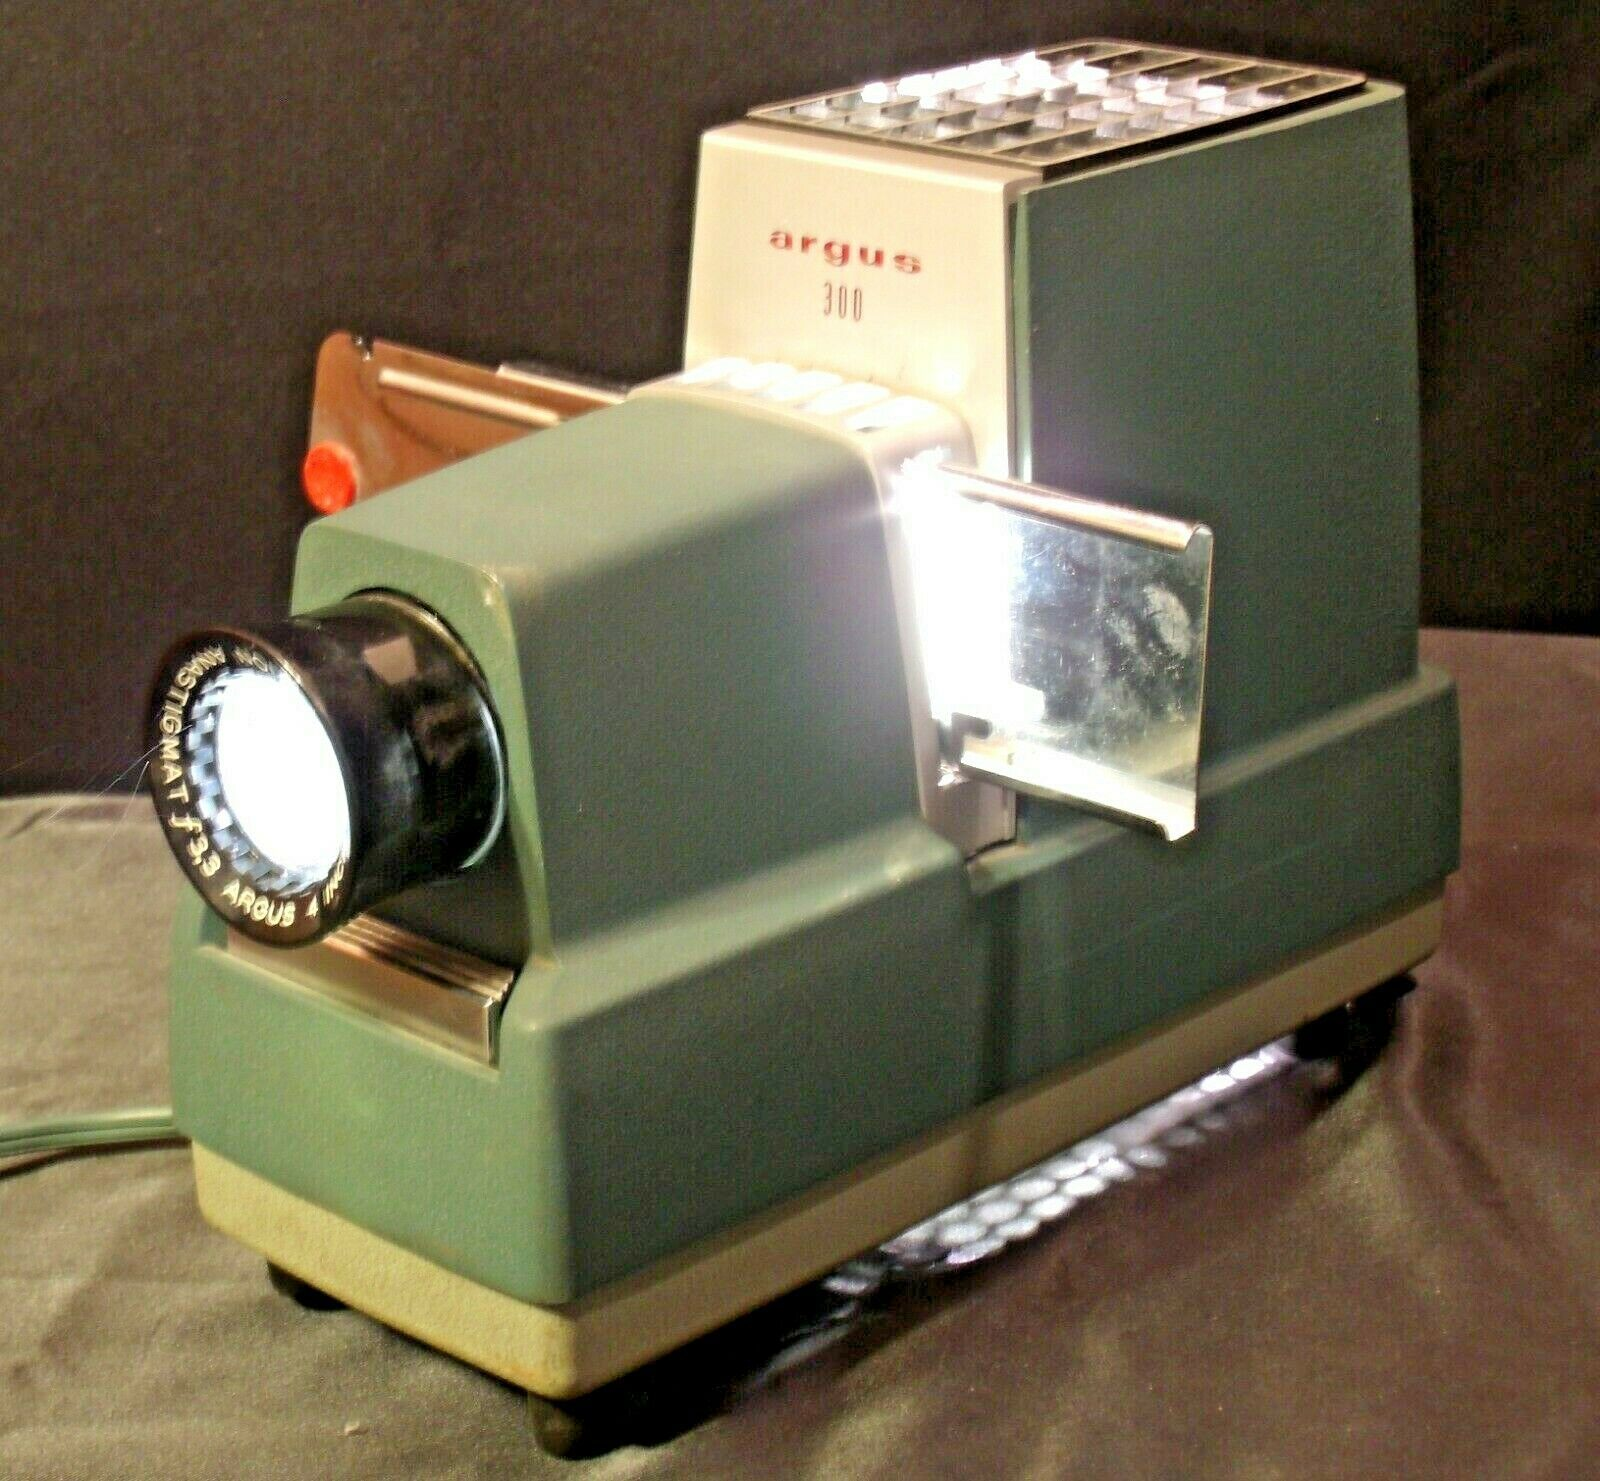 Argus 300 Model III Video Camera  AA19-2050 Vintage (USA)